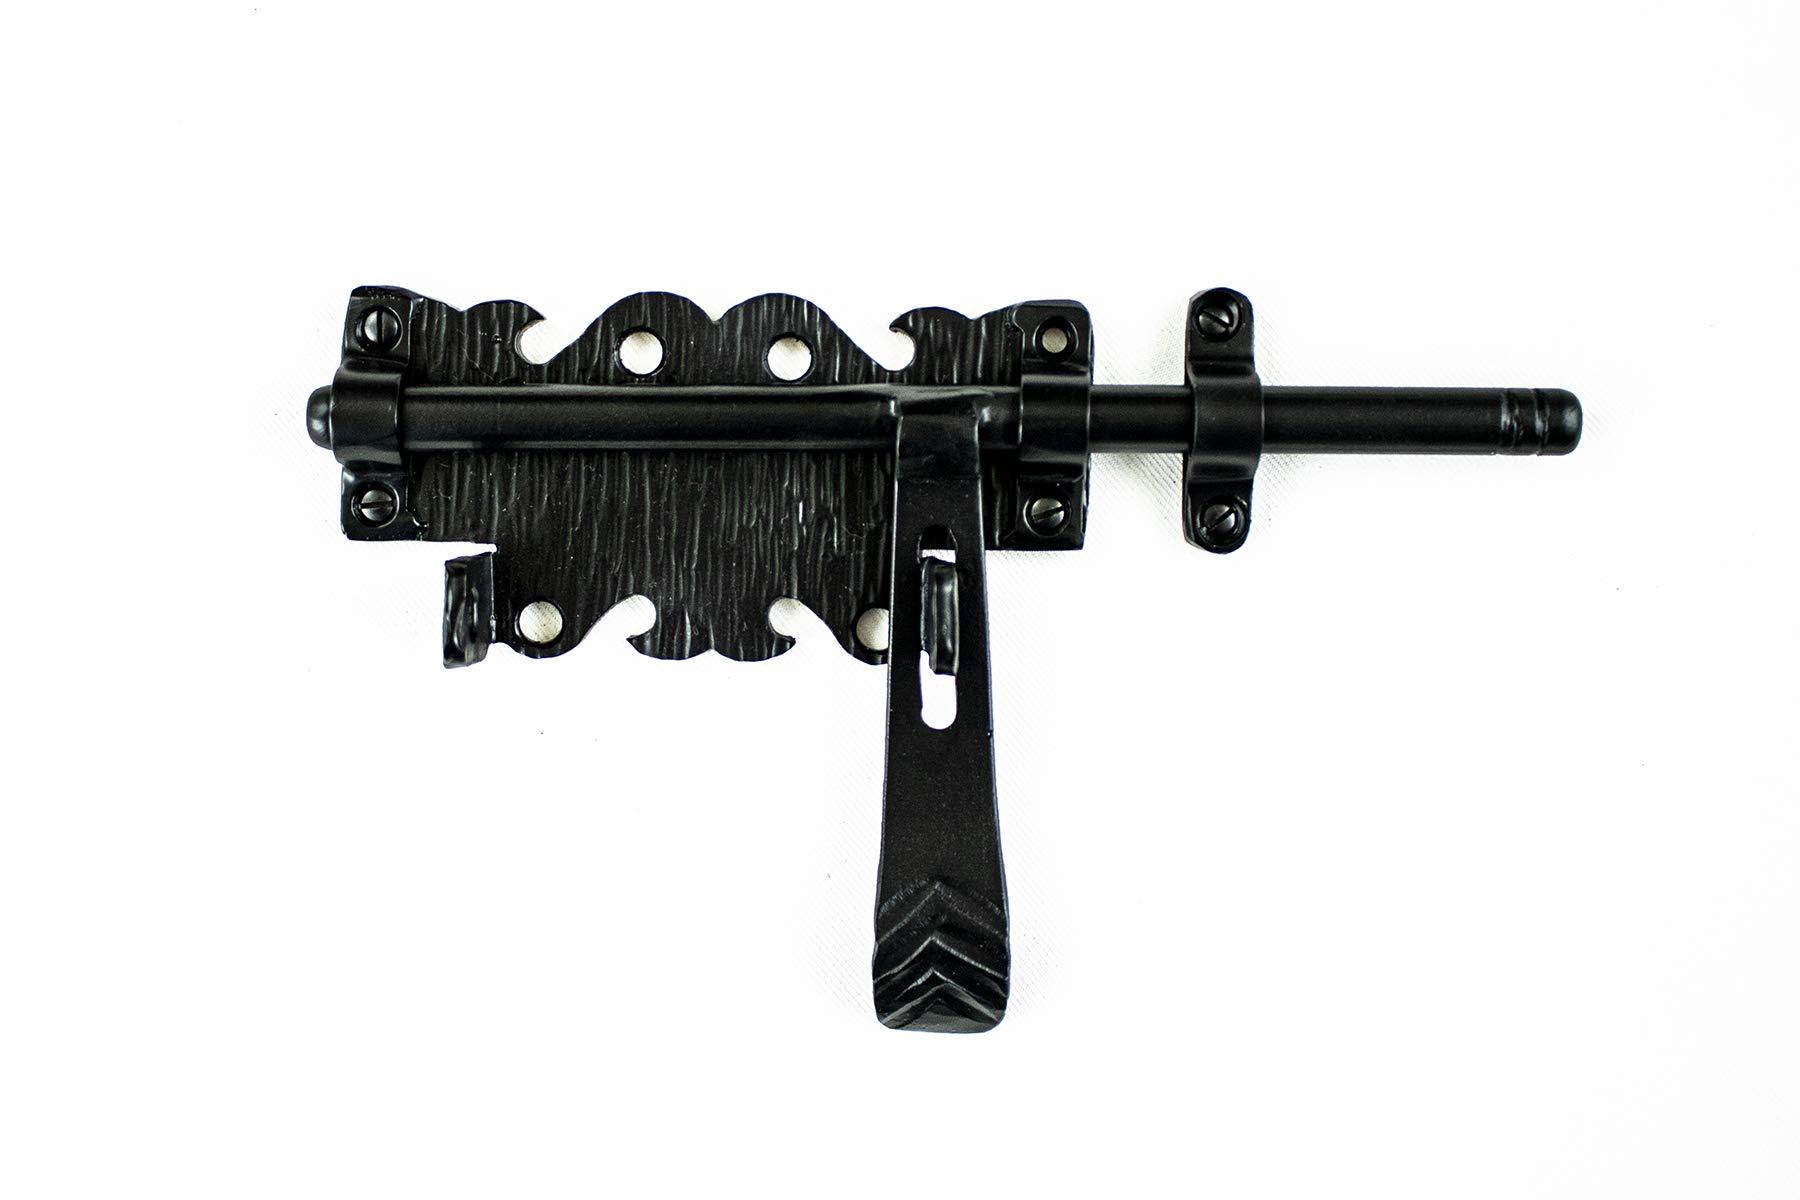 Barrel Bolt 9'' for Doors or Gates Rustic Hammered Iron Black Finish Hand Crafted Borderland Rustic Hardware